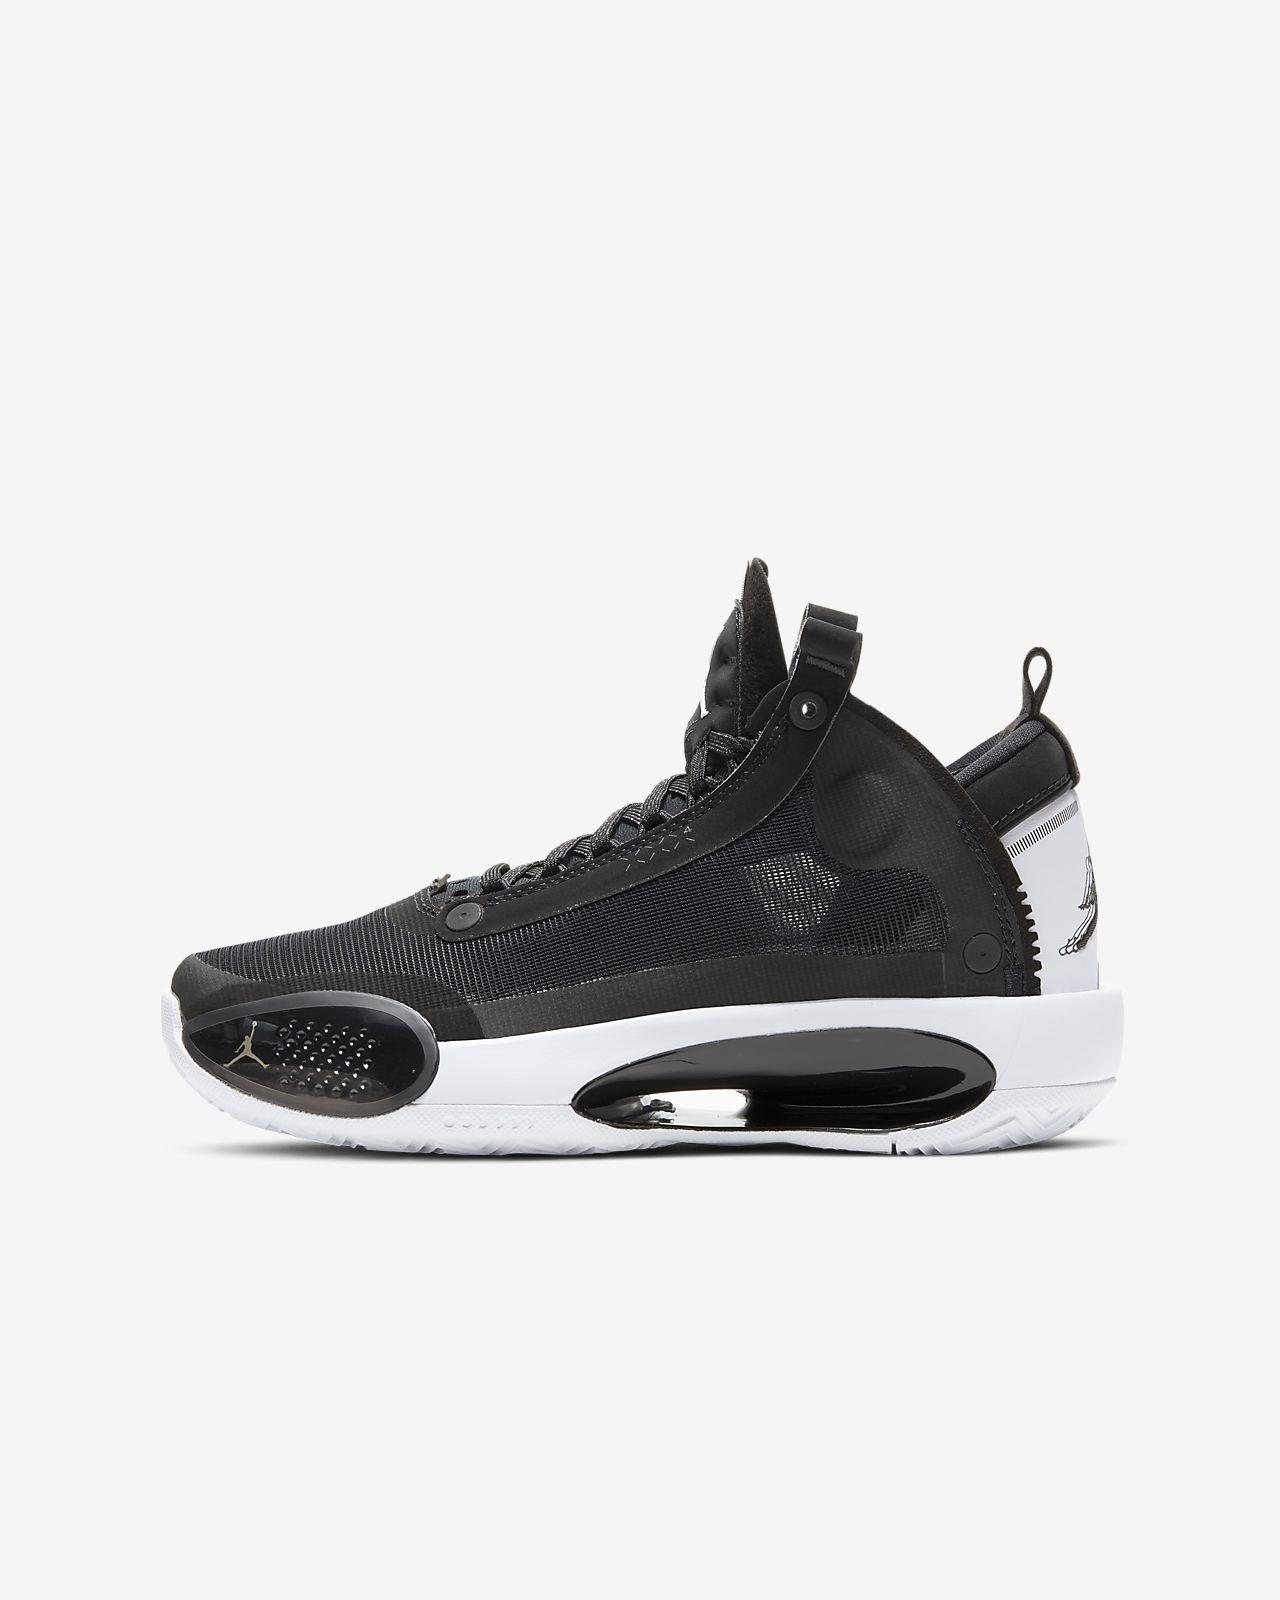 Air Jordan XXXIV Basketbalschoen voor kids